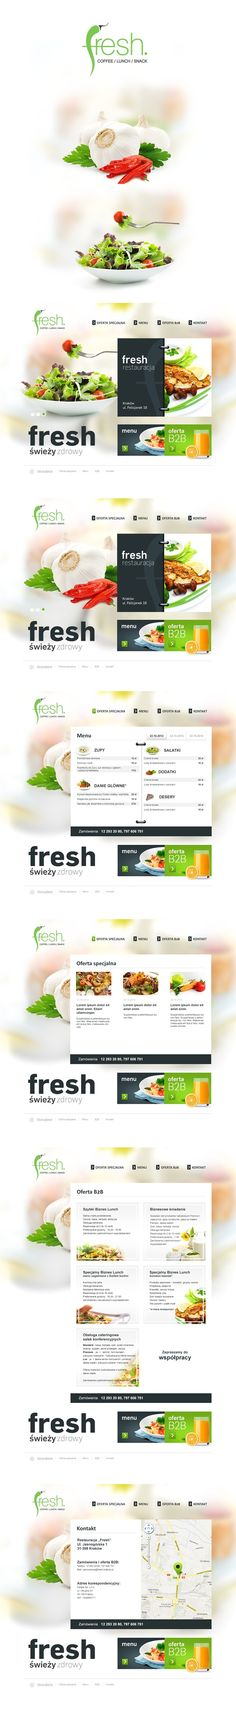 Fresh #webdesign